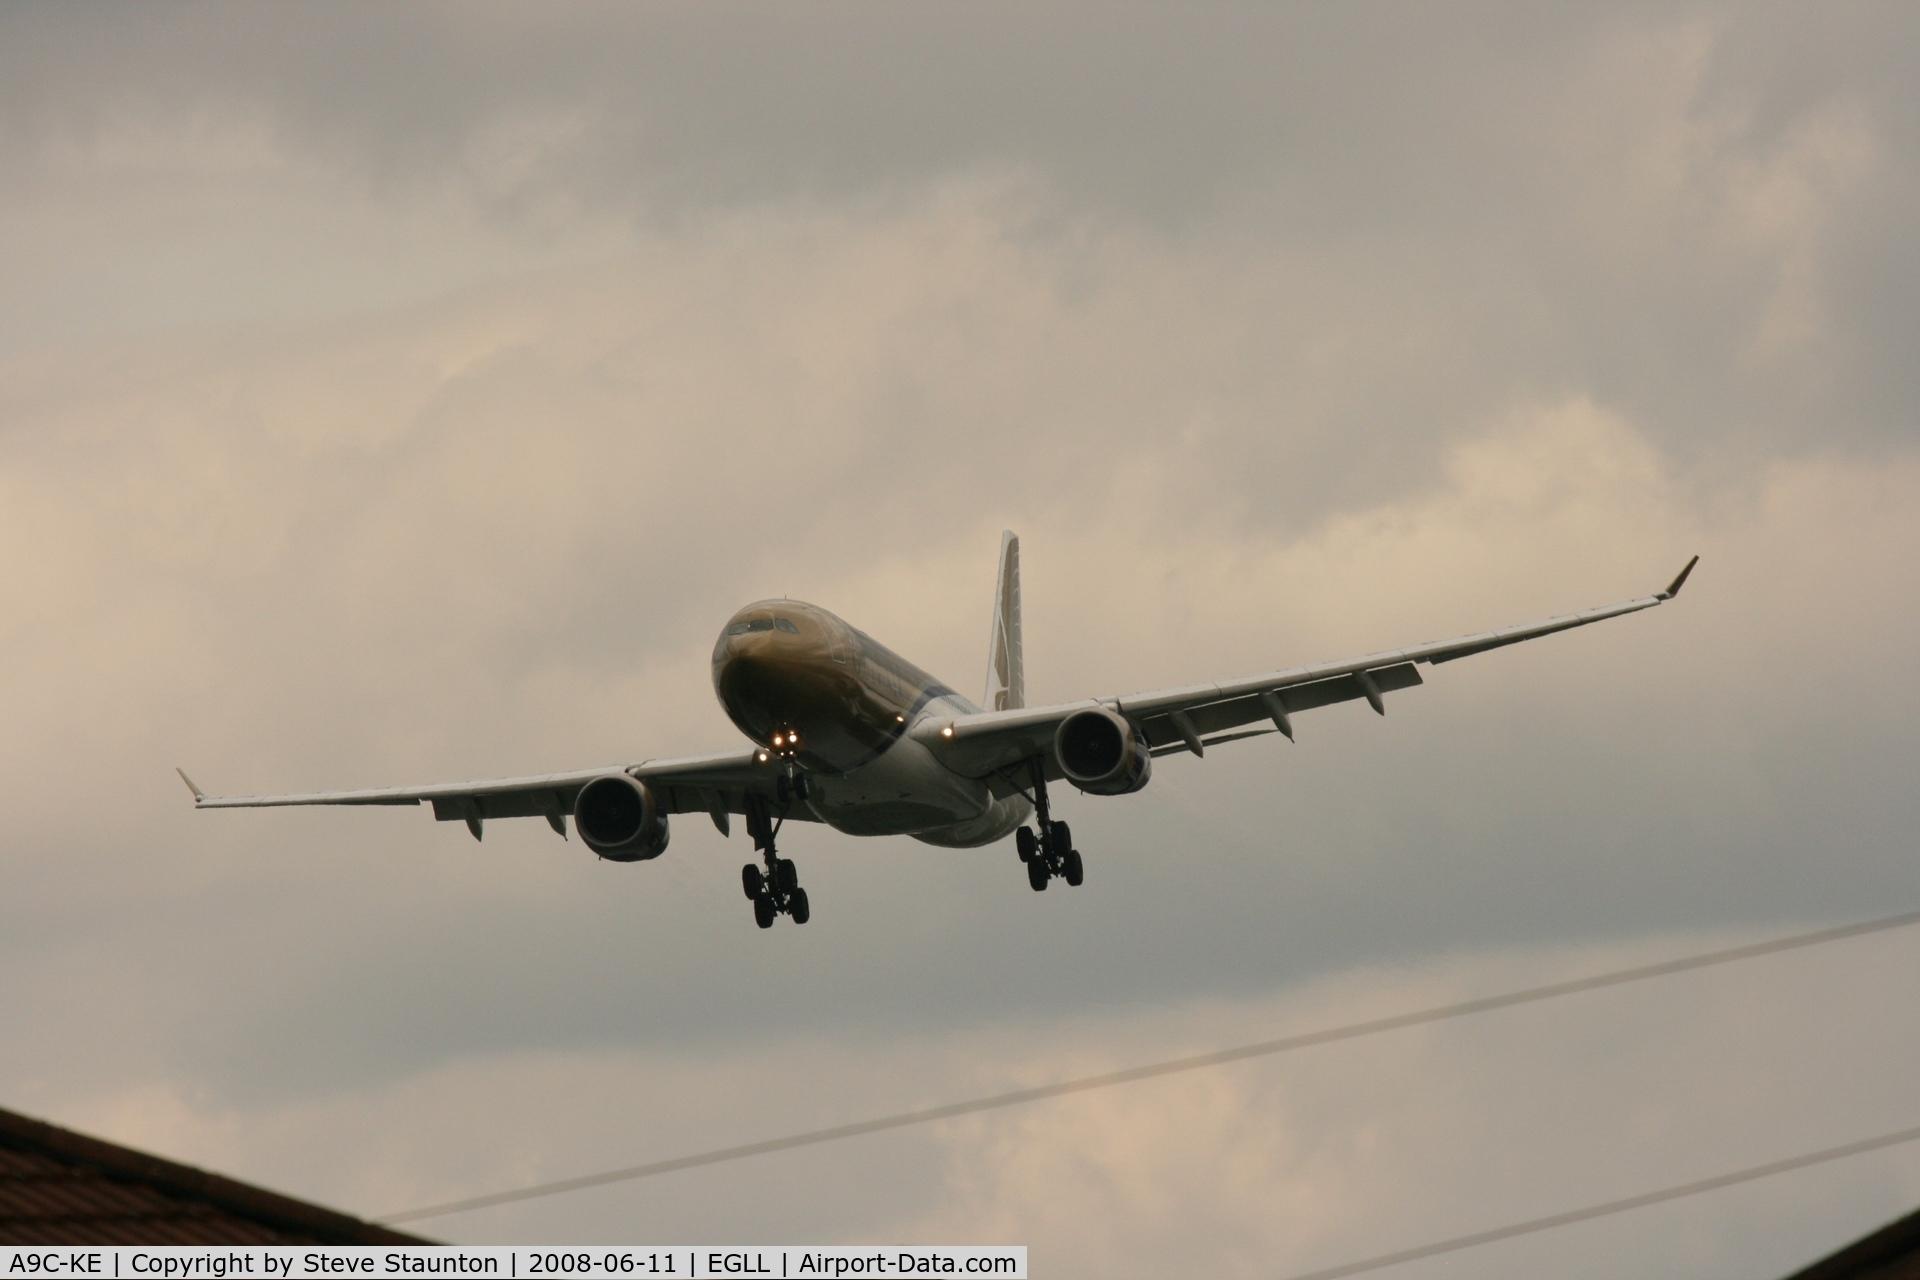 A9C-KE, 2000 Airbus A330-243 C/N 334, Taken at London Heathrow 11th June 2008